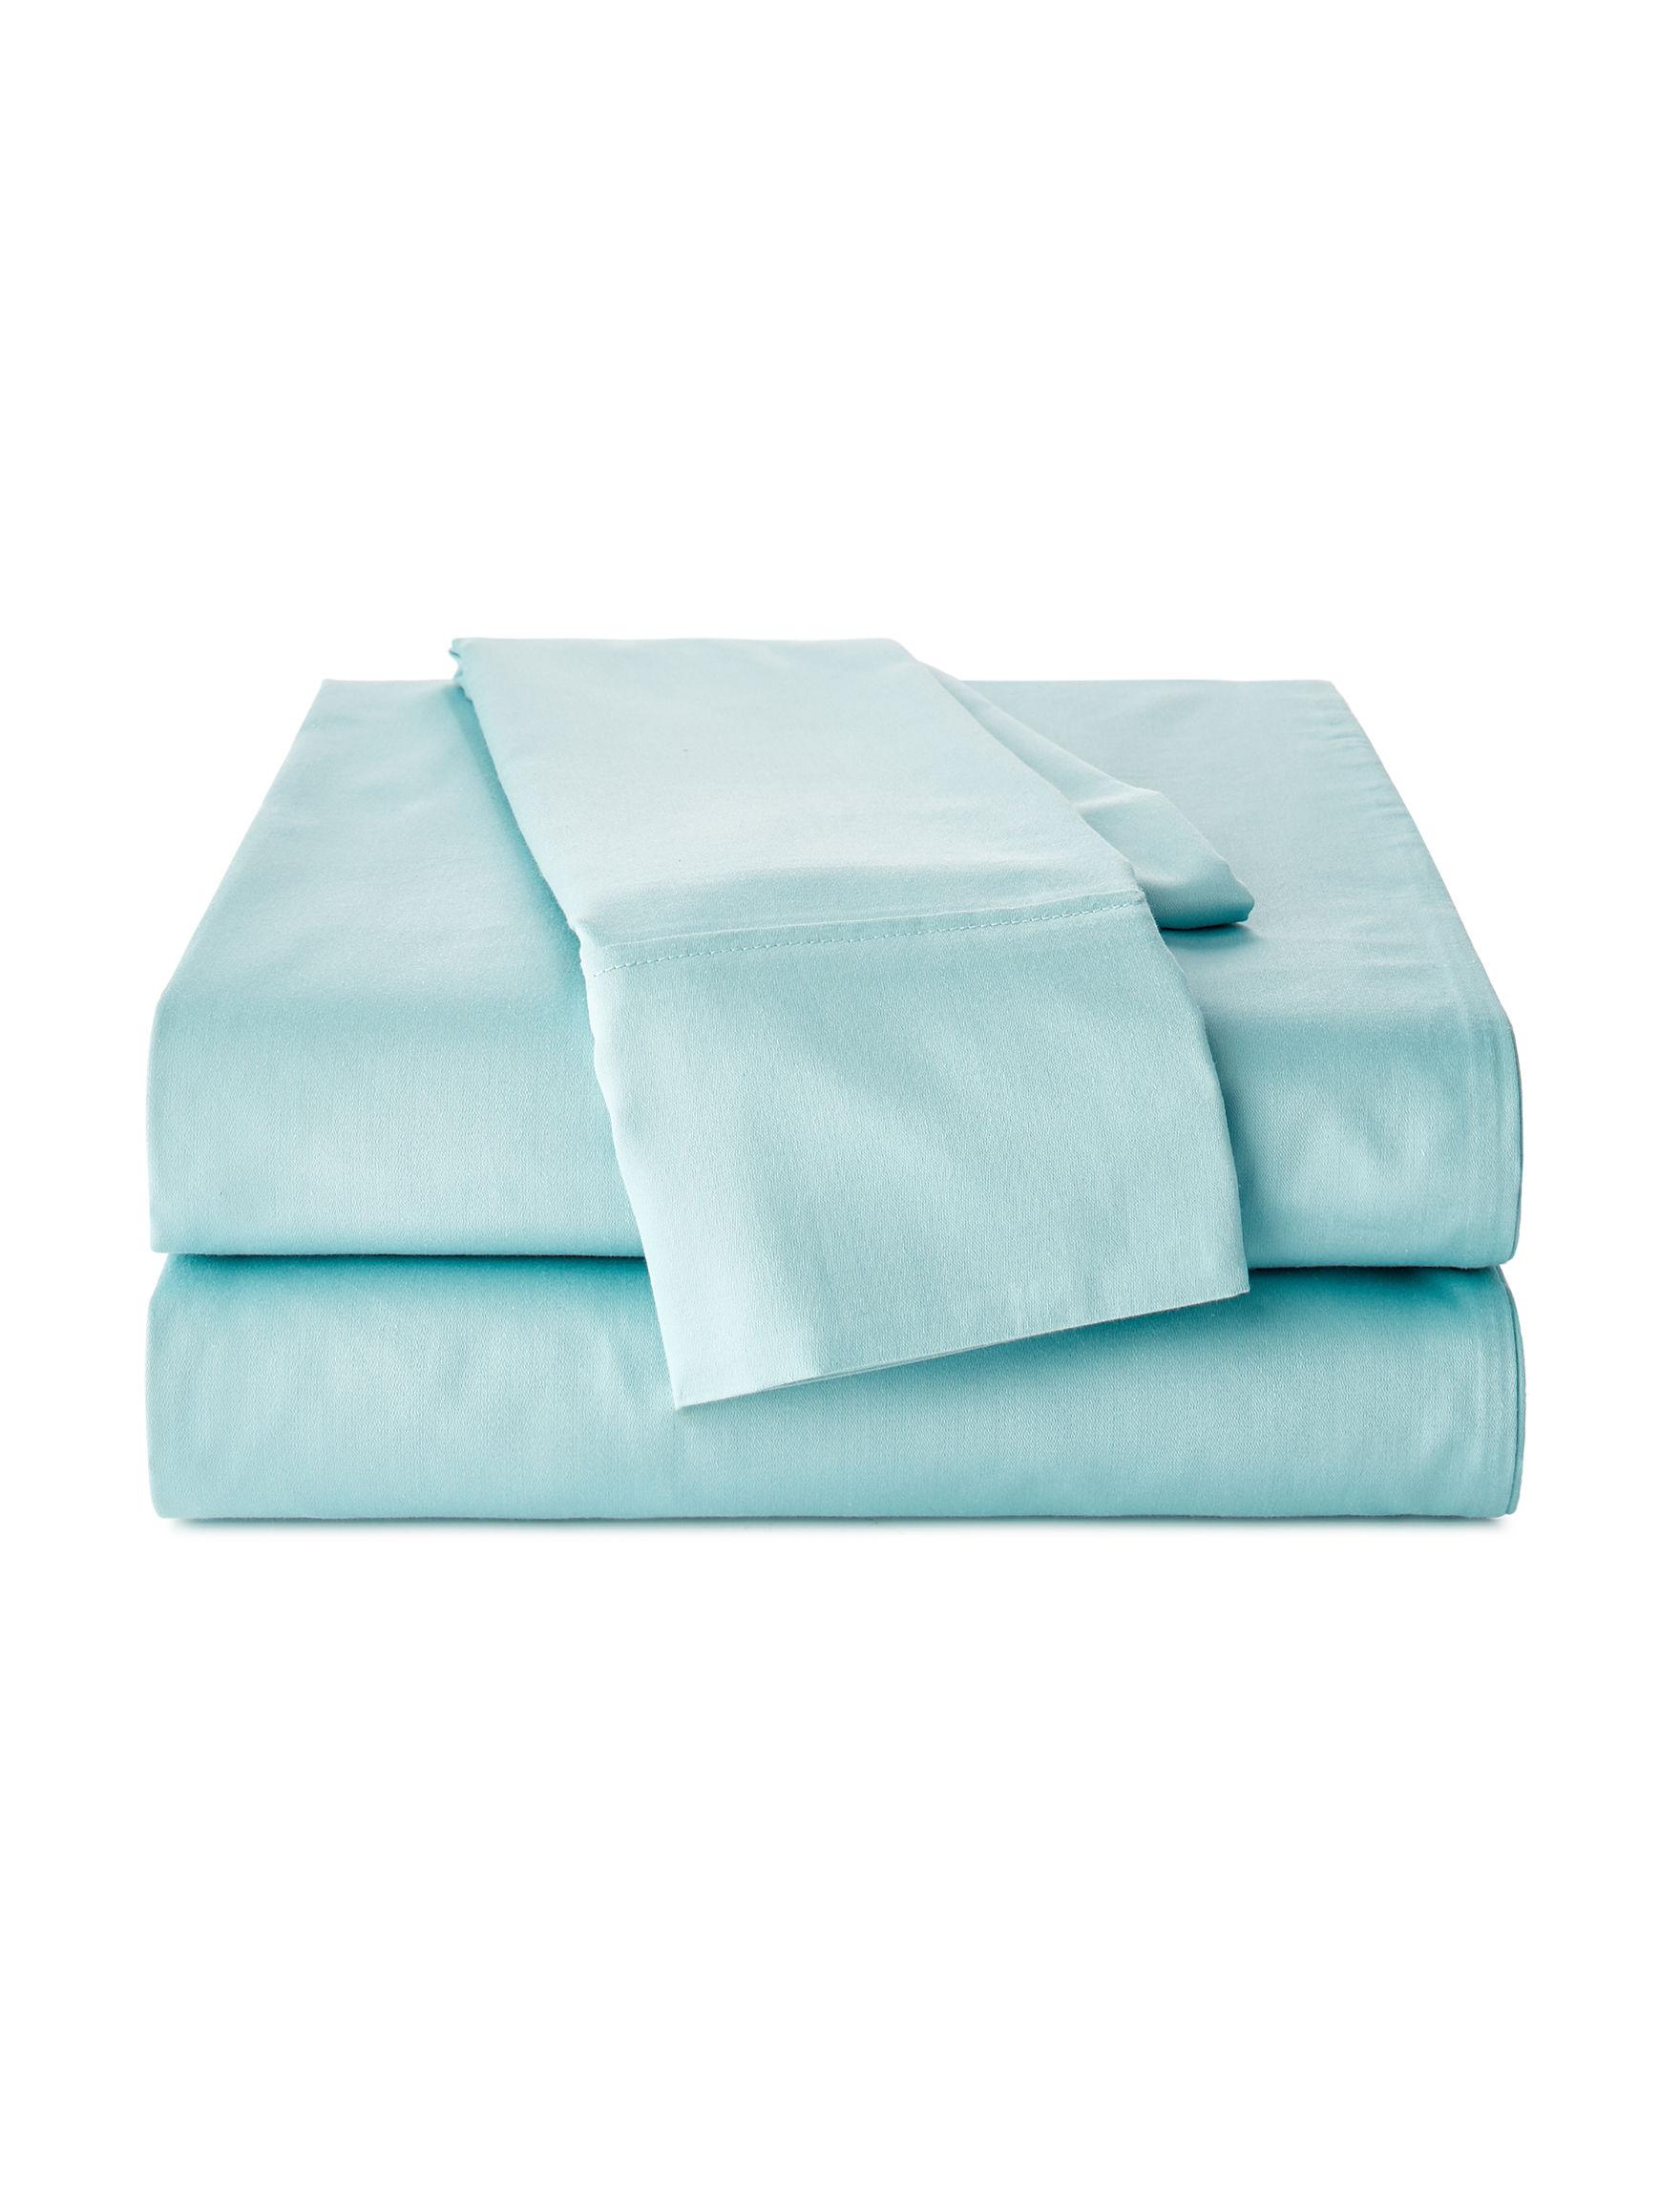 Grand Manor Light Blue Sheets